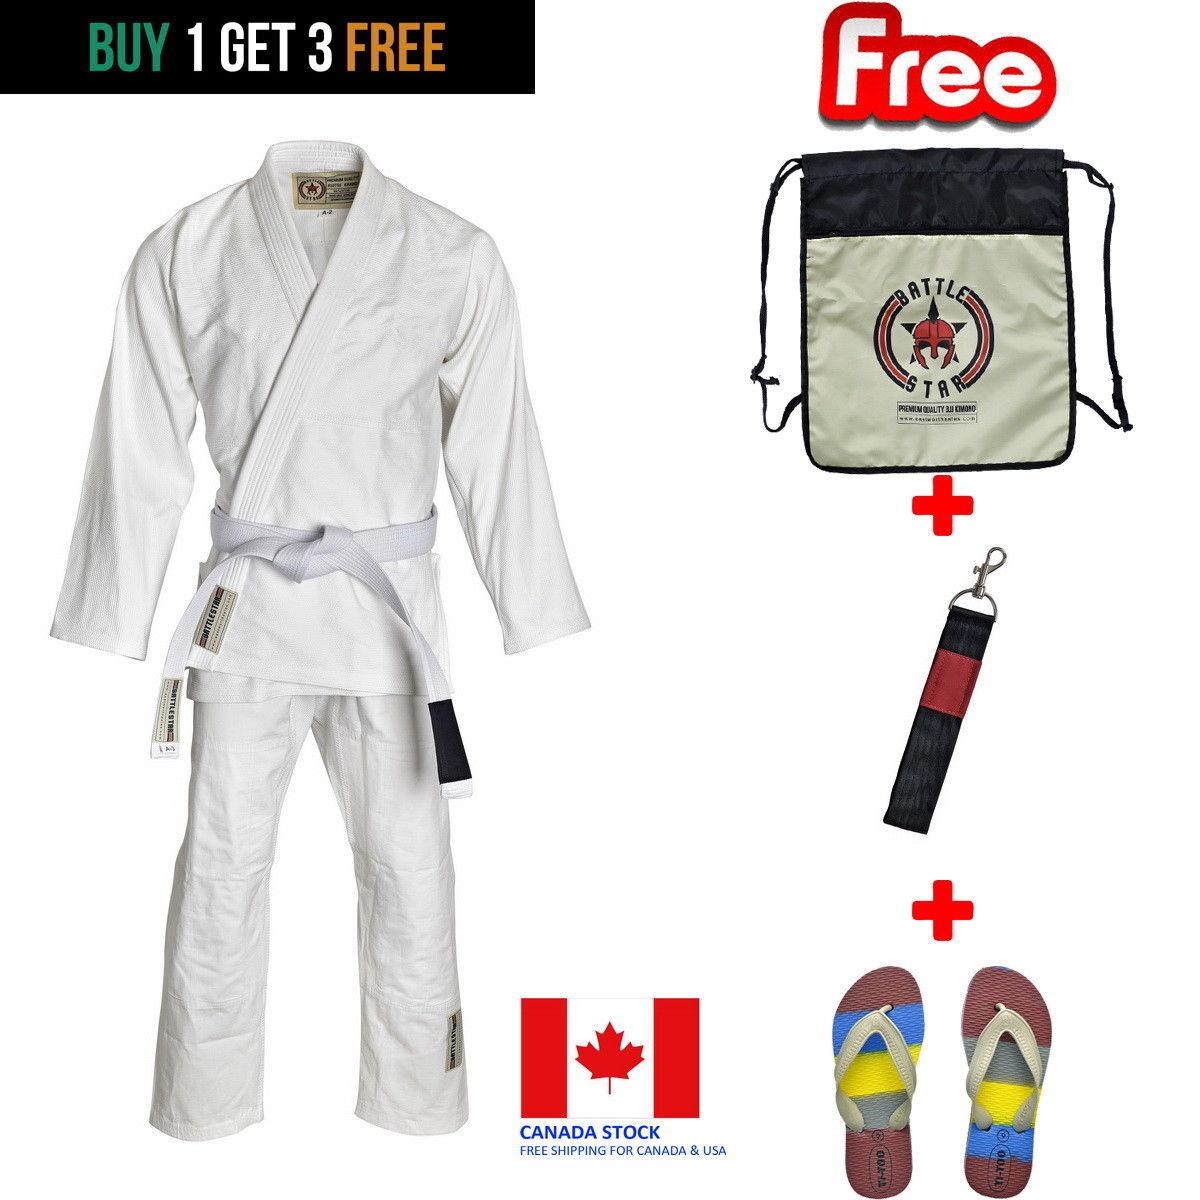 White BJJ Ladies Fit GI  450 GSM  Pearlweave  Ripstop Brazilian Jiu-jitsu Kimono  sale with high discount